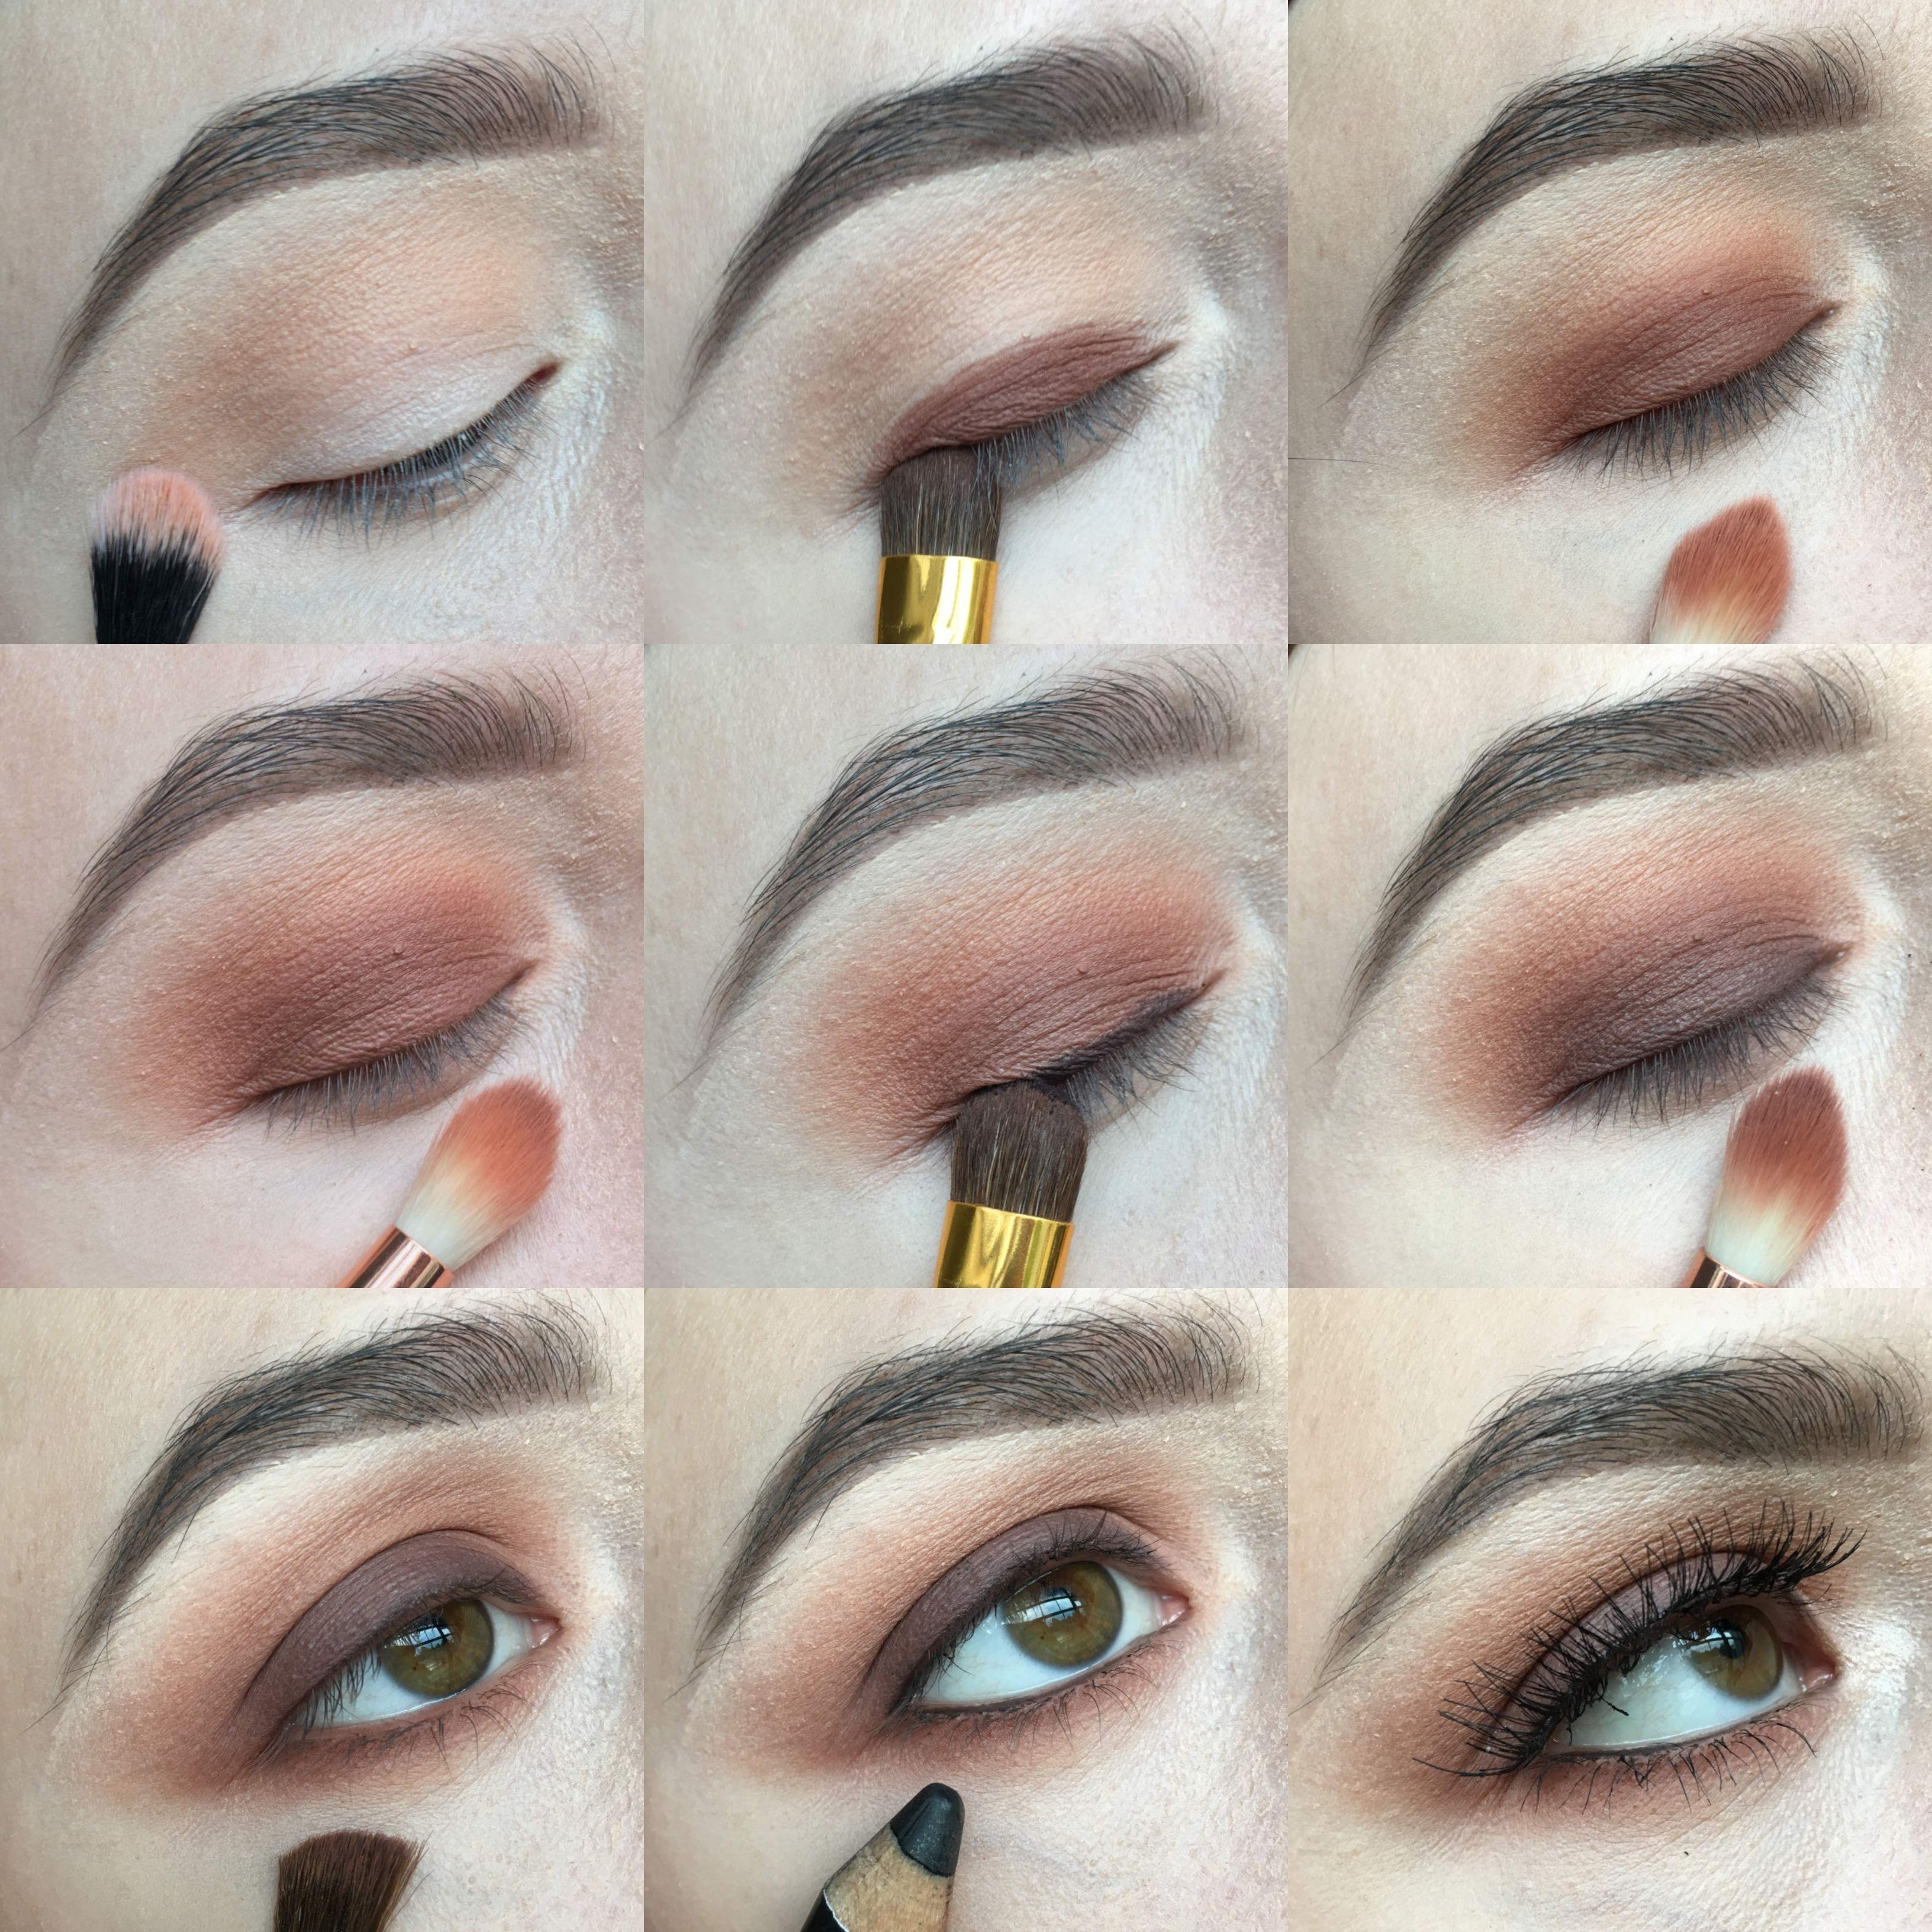 easy brown smokey eye - step by step tutorial | brown smokey